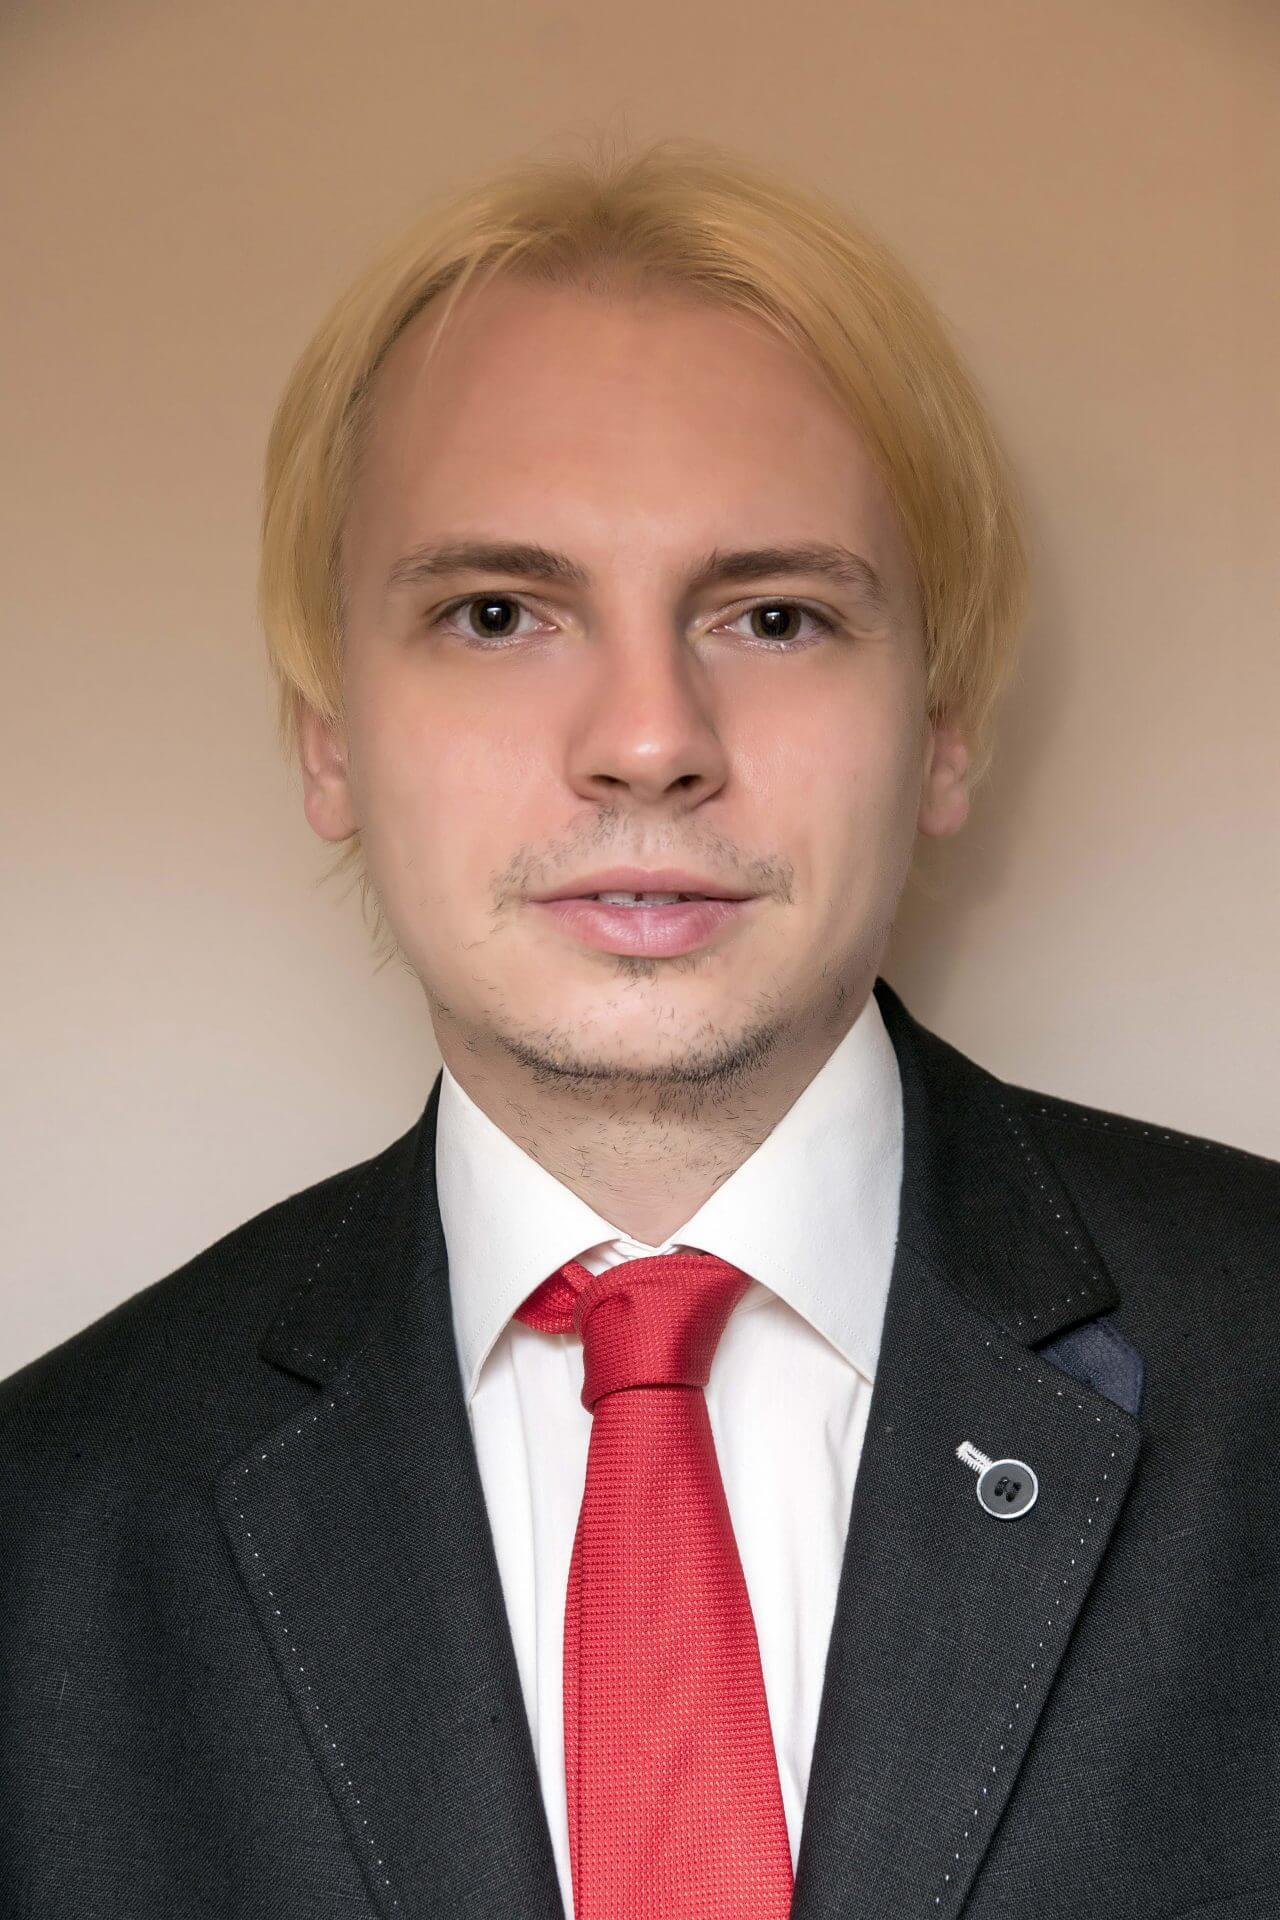 Marek Adam Grabowski